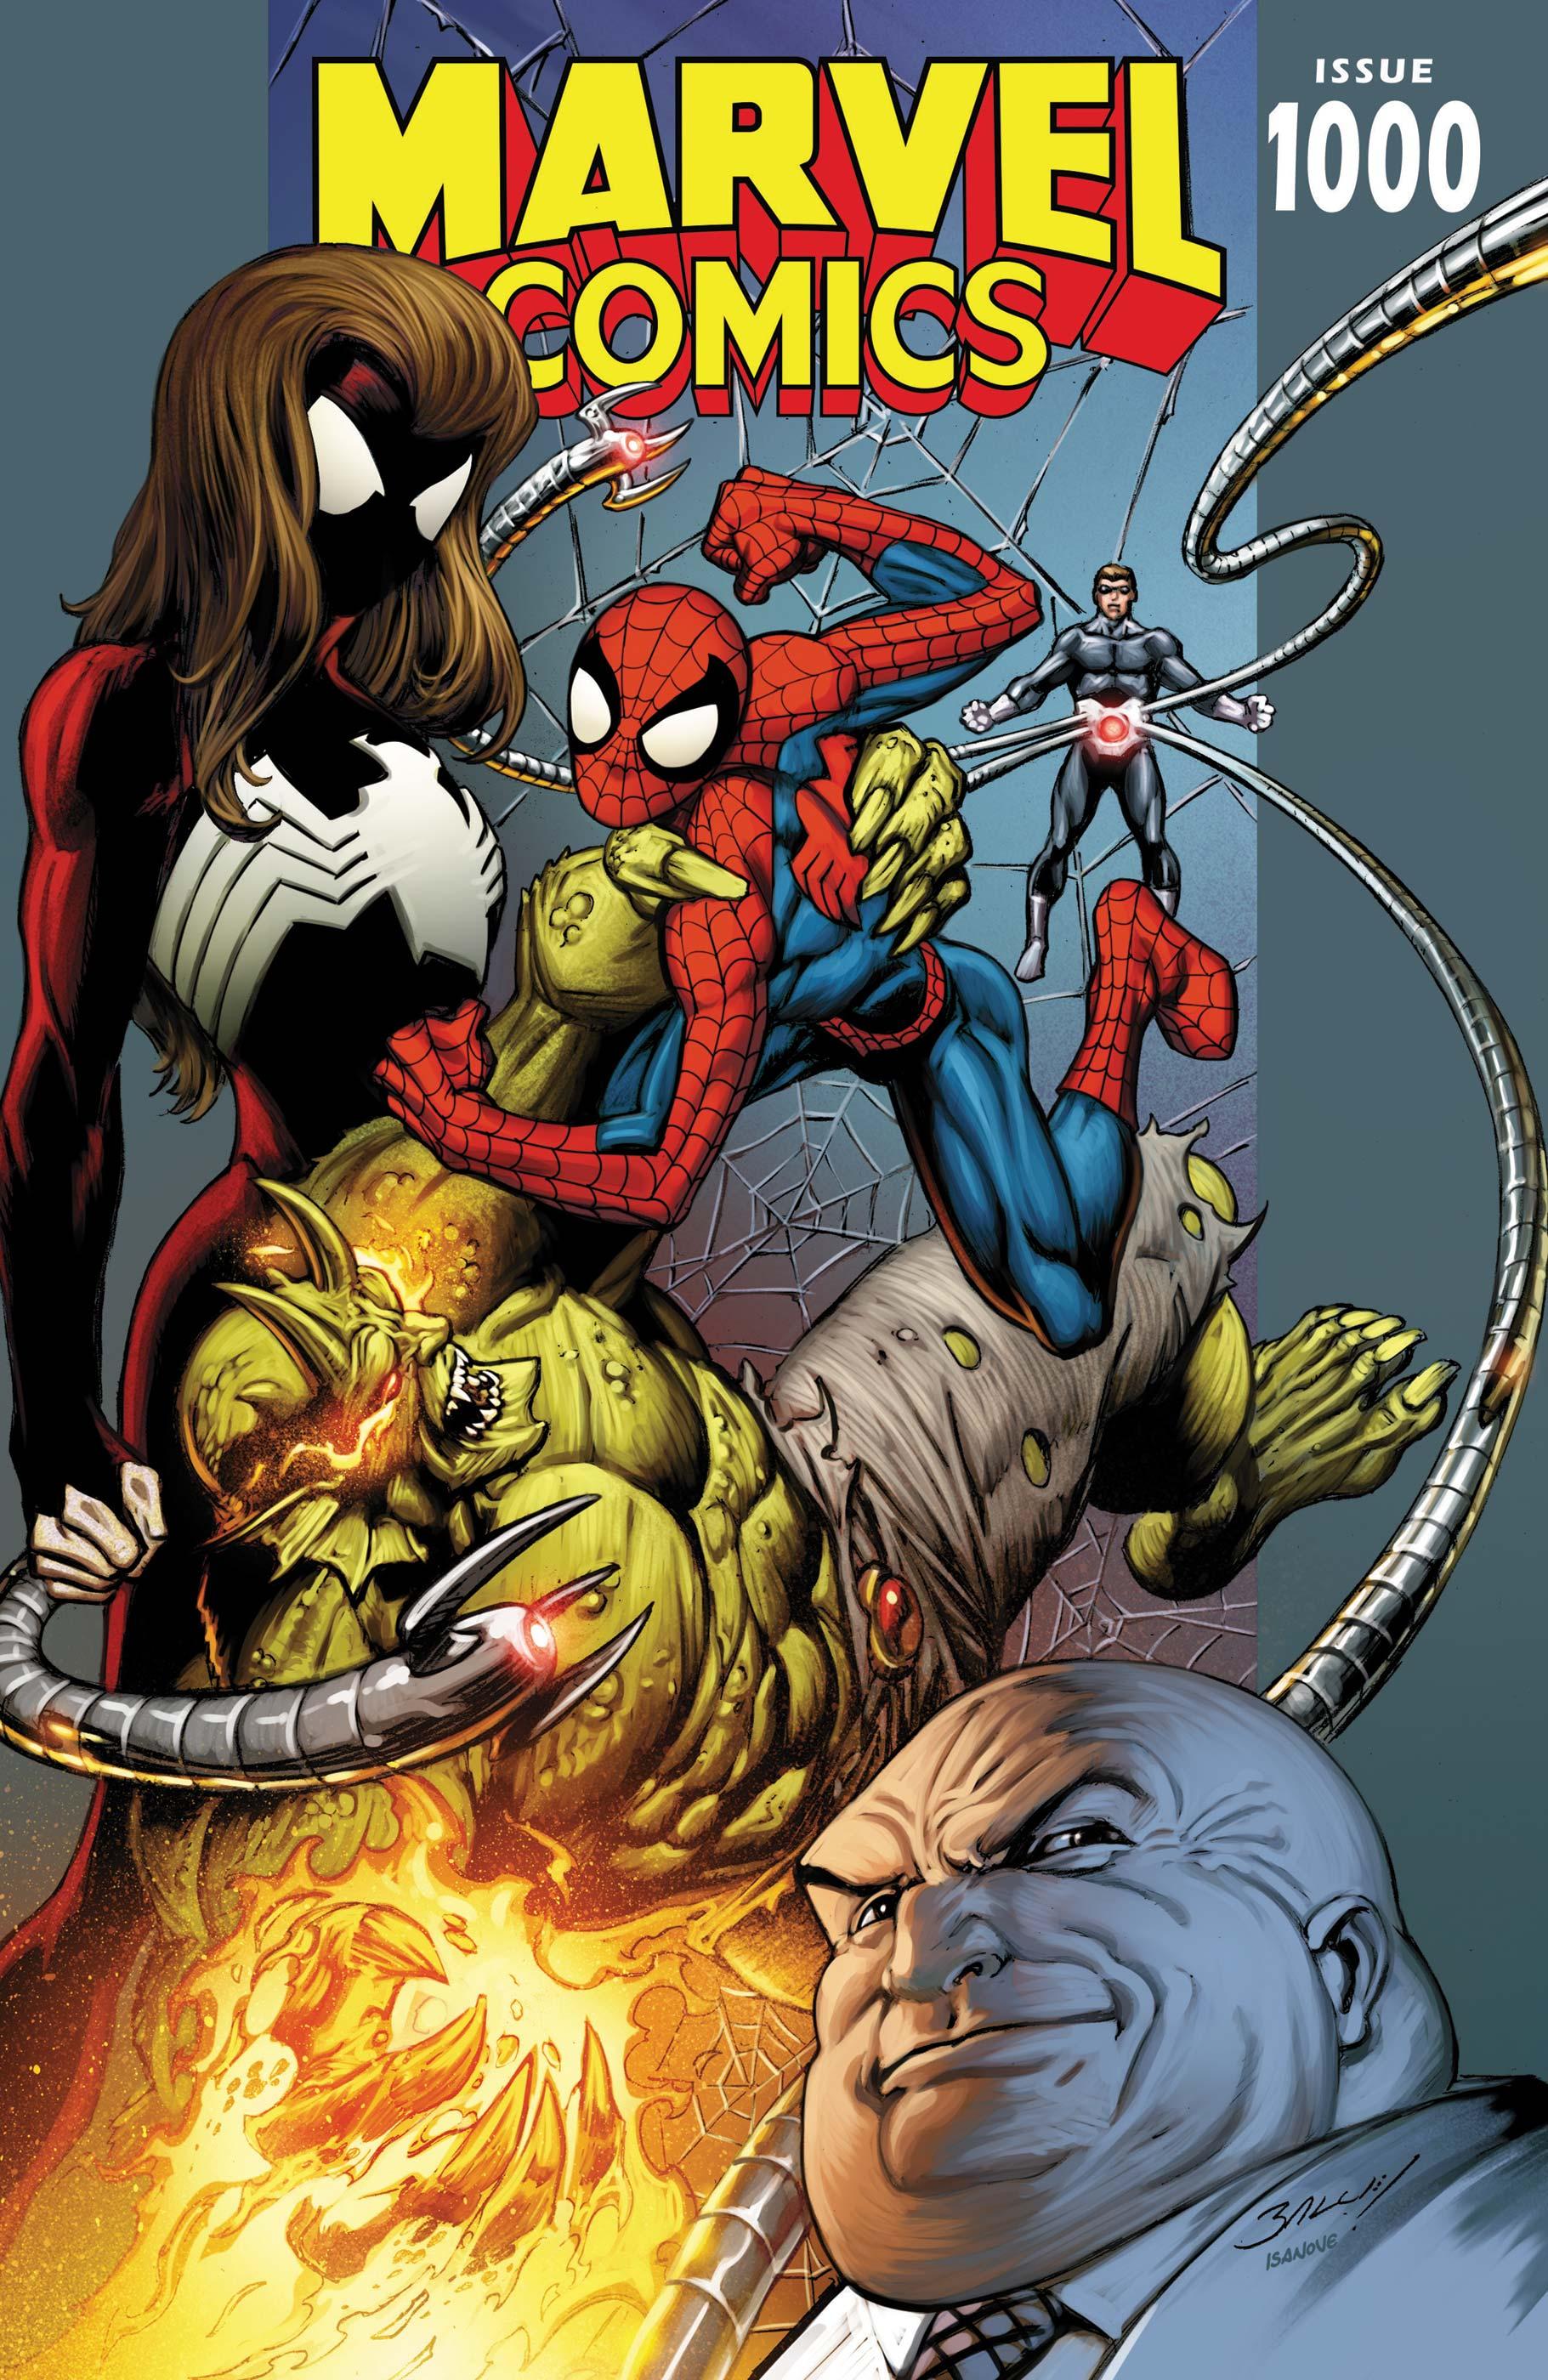 Marvel Comics (2019) #1000 (Variant)